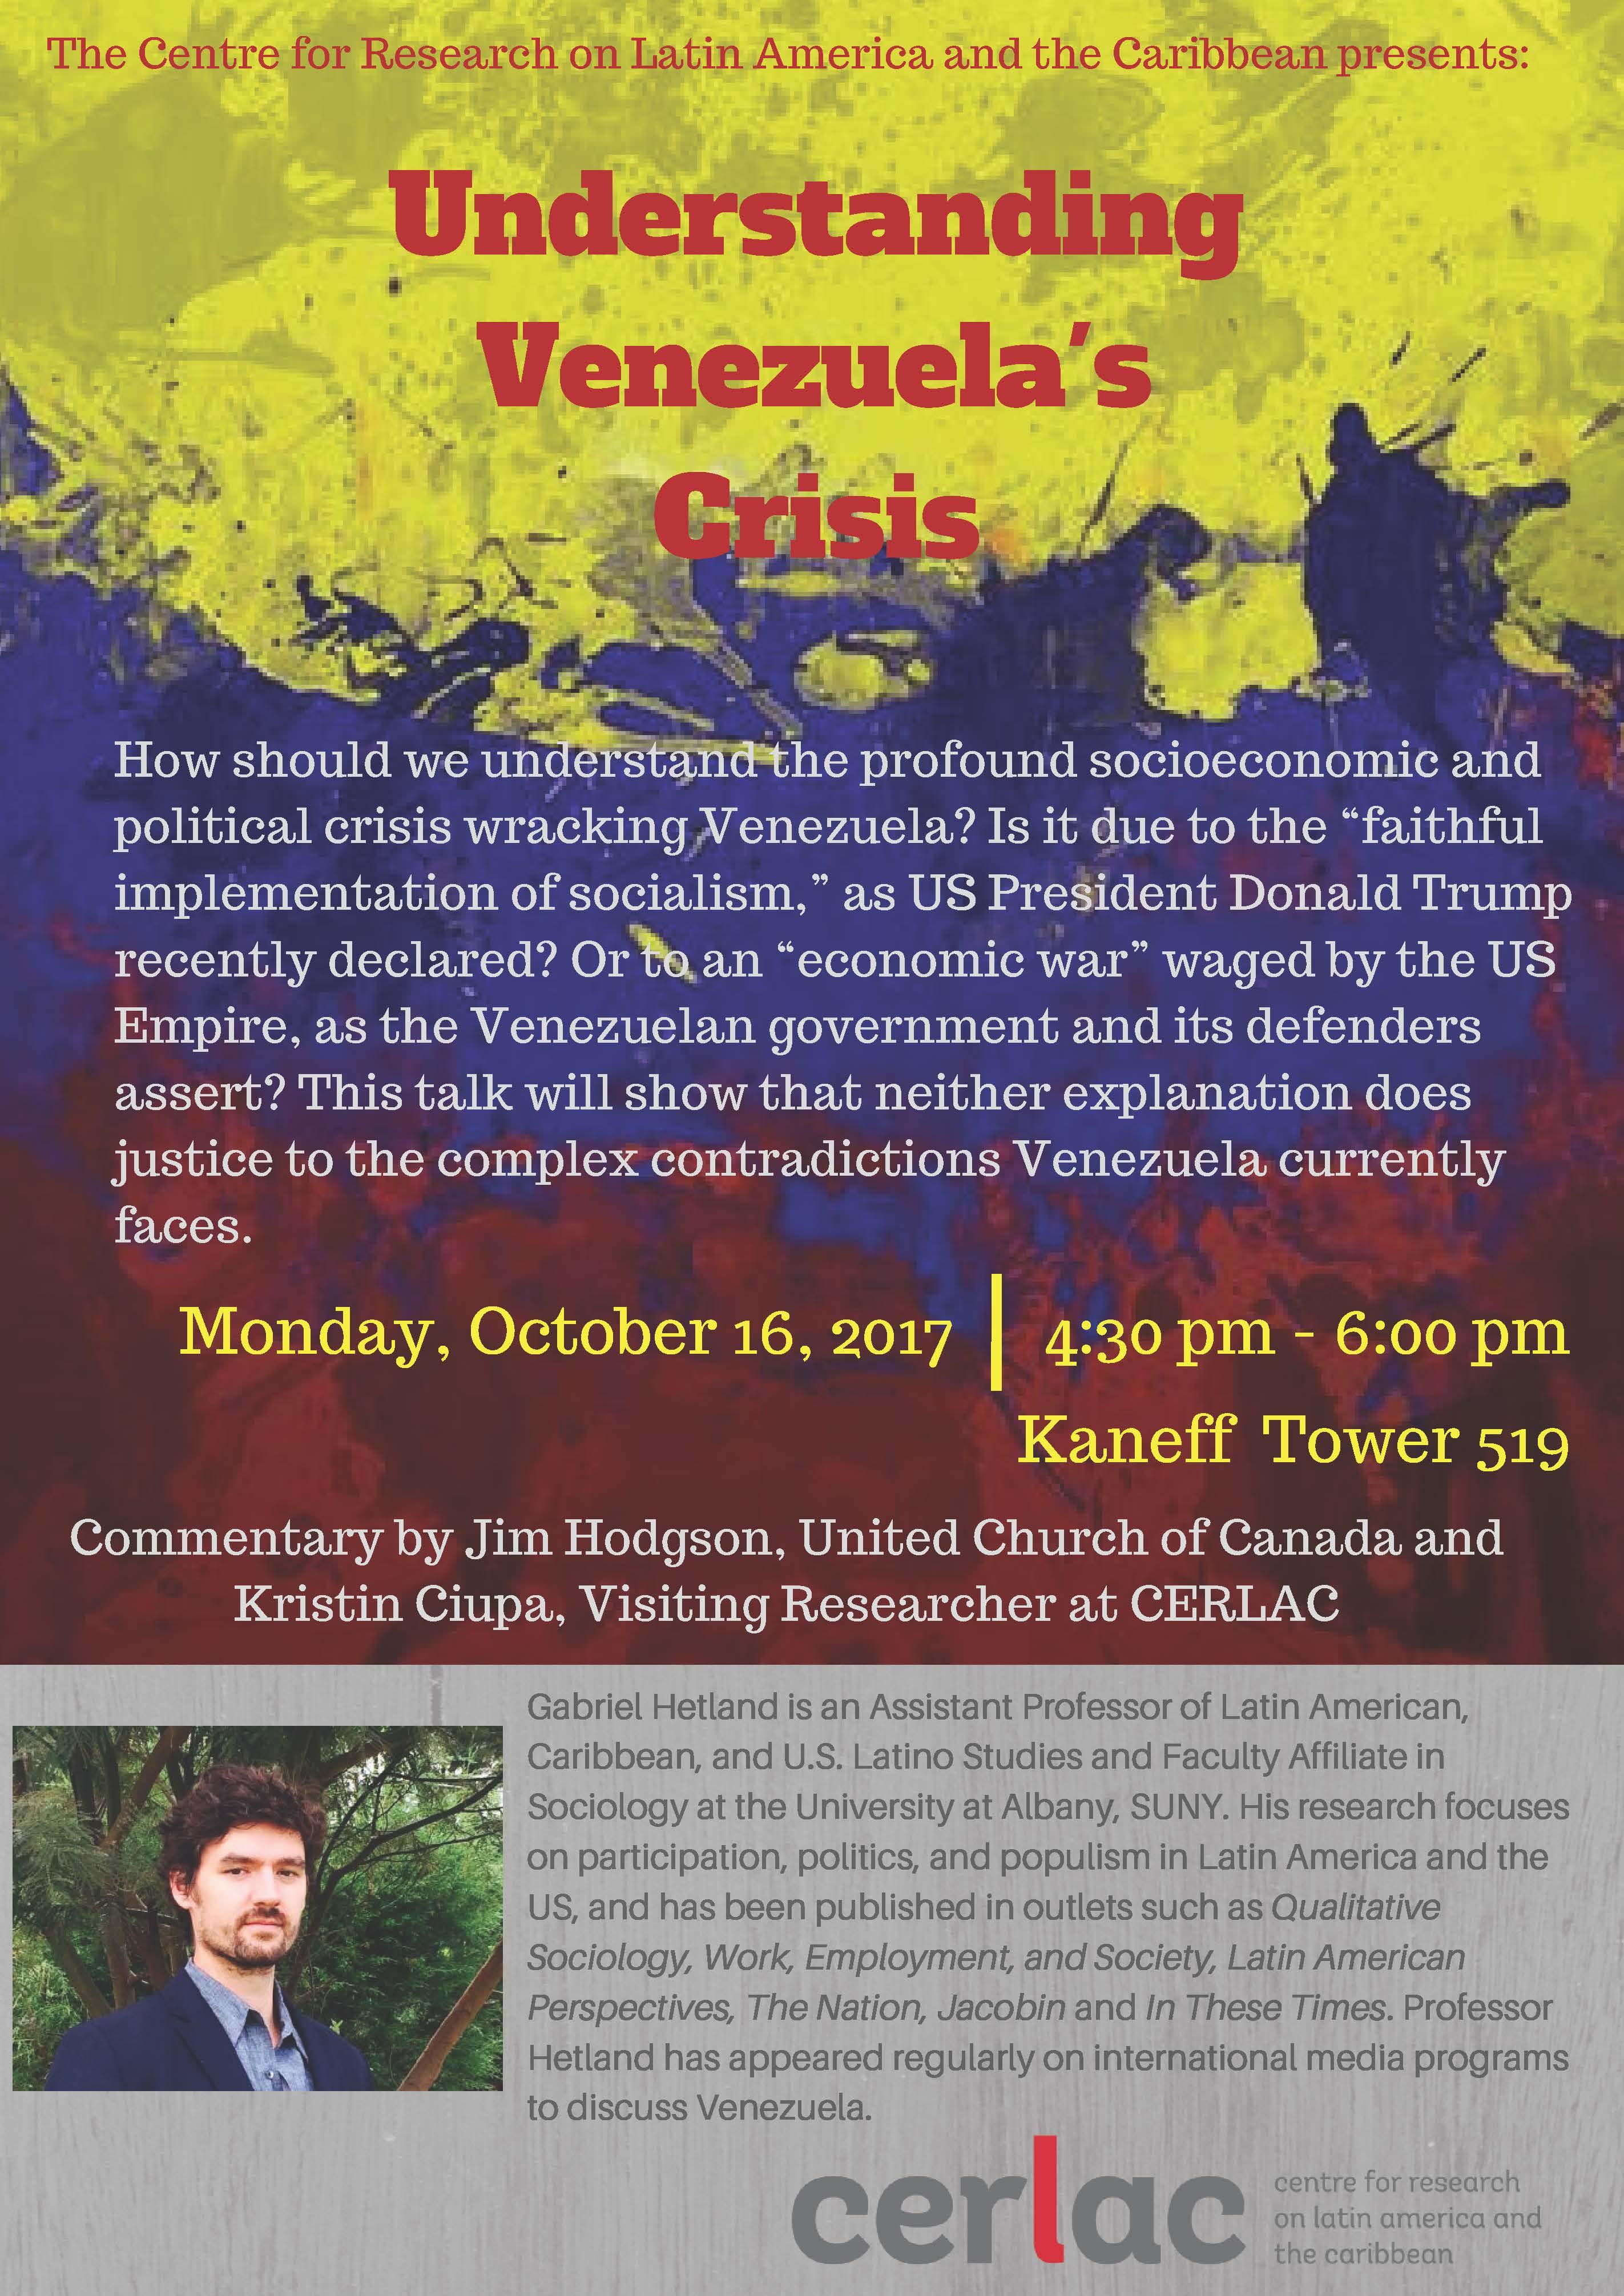 Understanding Venezuela's Crisis @ Kaneff Tower 519 | Toronto | Ontario | Canada